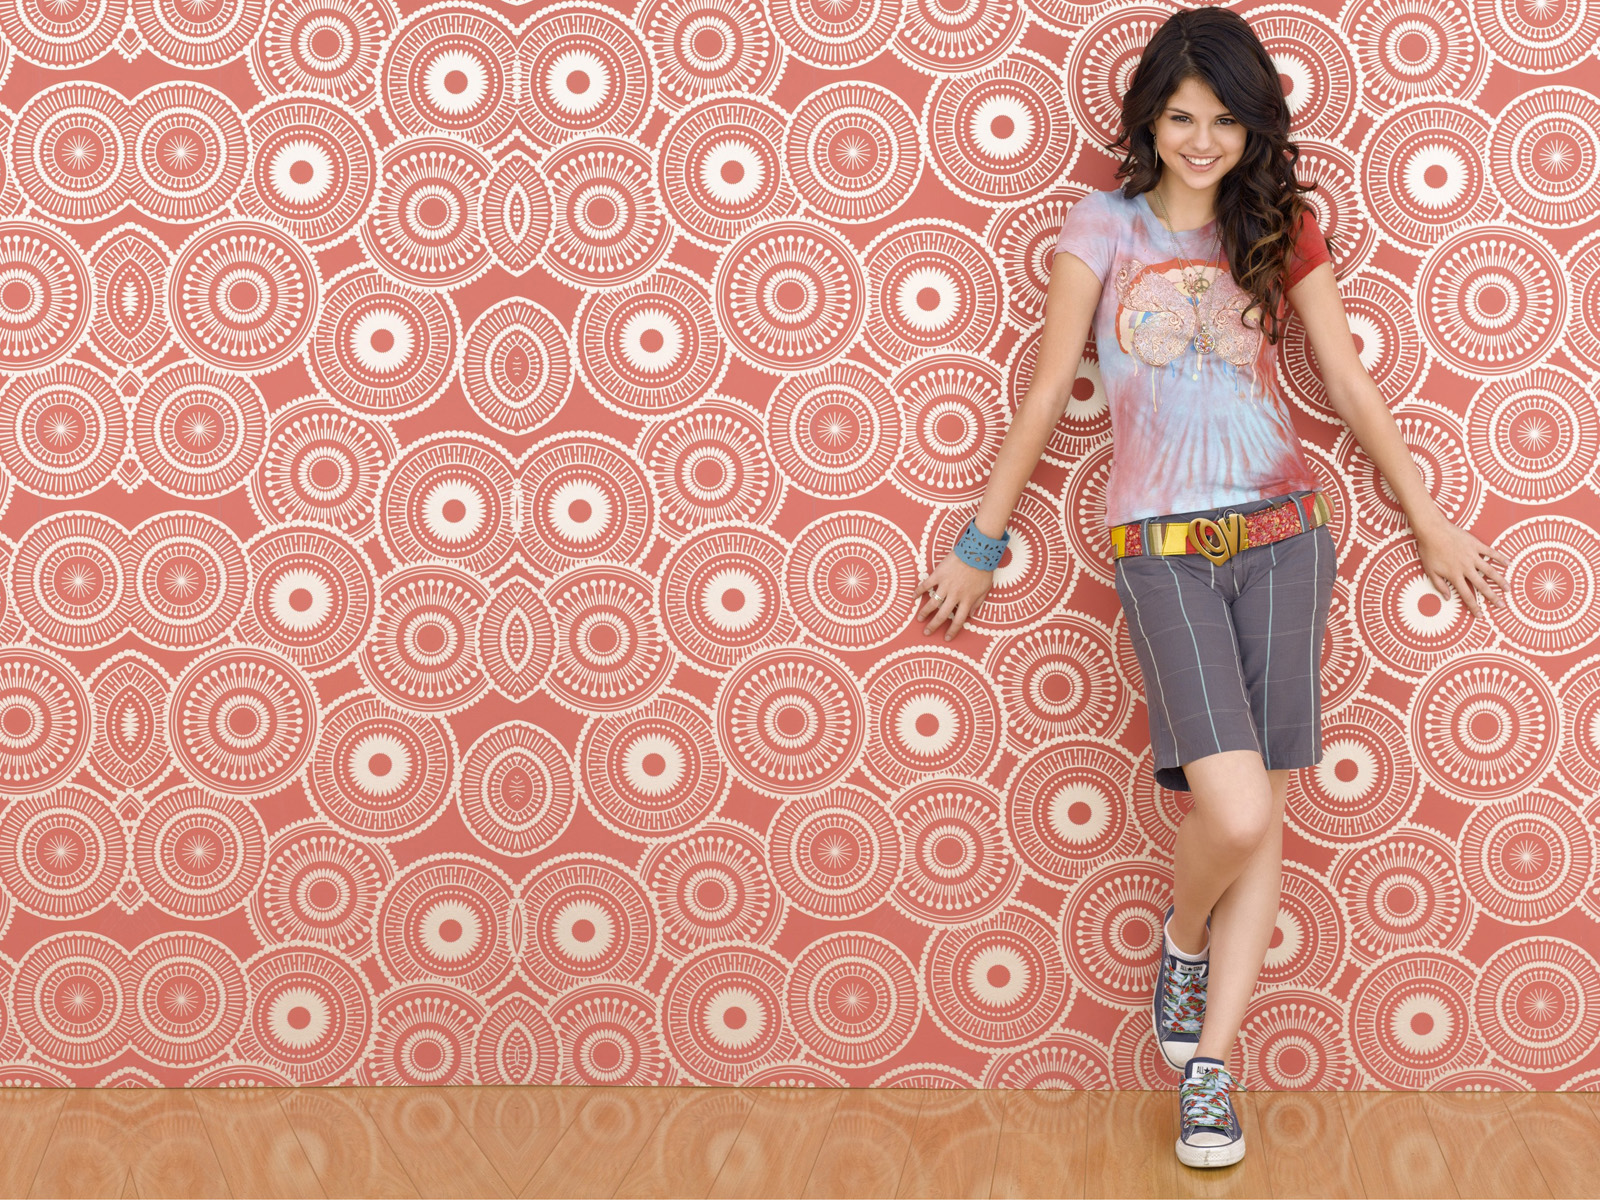 http://3.bp.blogspot.com/-SDerws-sig4/ToHOSWxC2eI/AAAAAAAAAZI/zc9SKZ2xA0k/s1600/The-best-top-desktop-selena-gomez-wallpapers-selena-gomez-wallpaper-hd-1.jpg